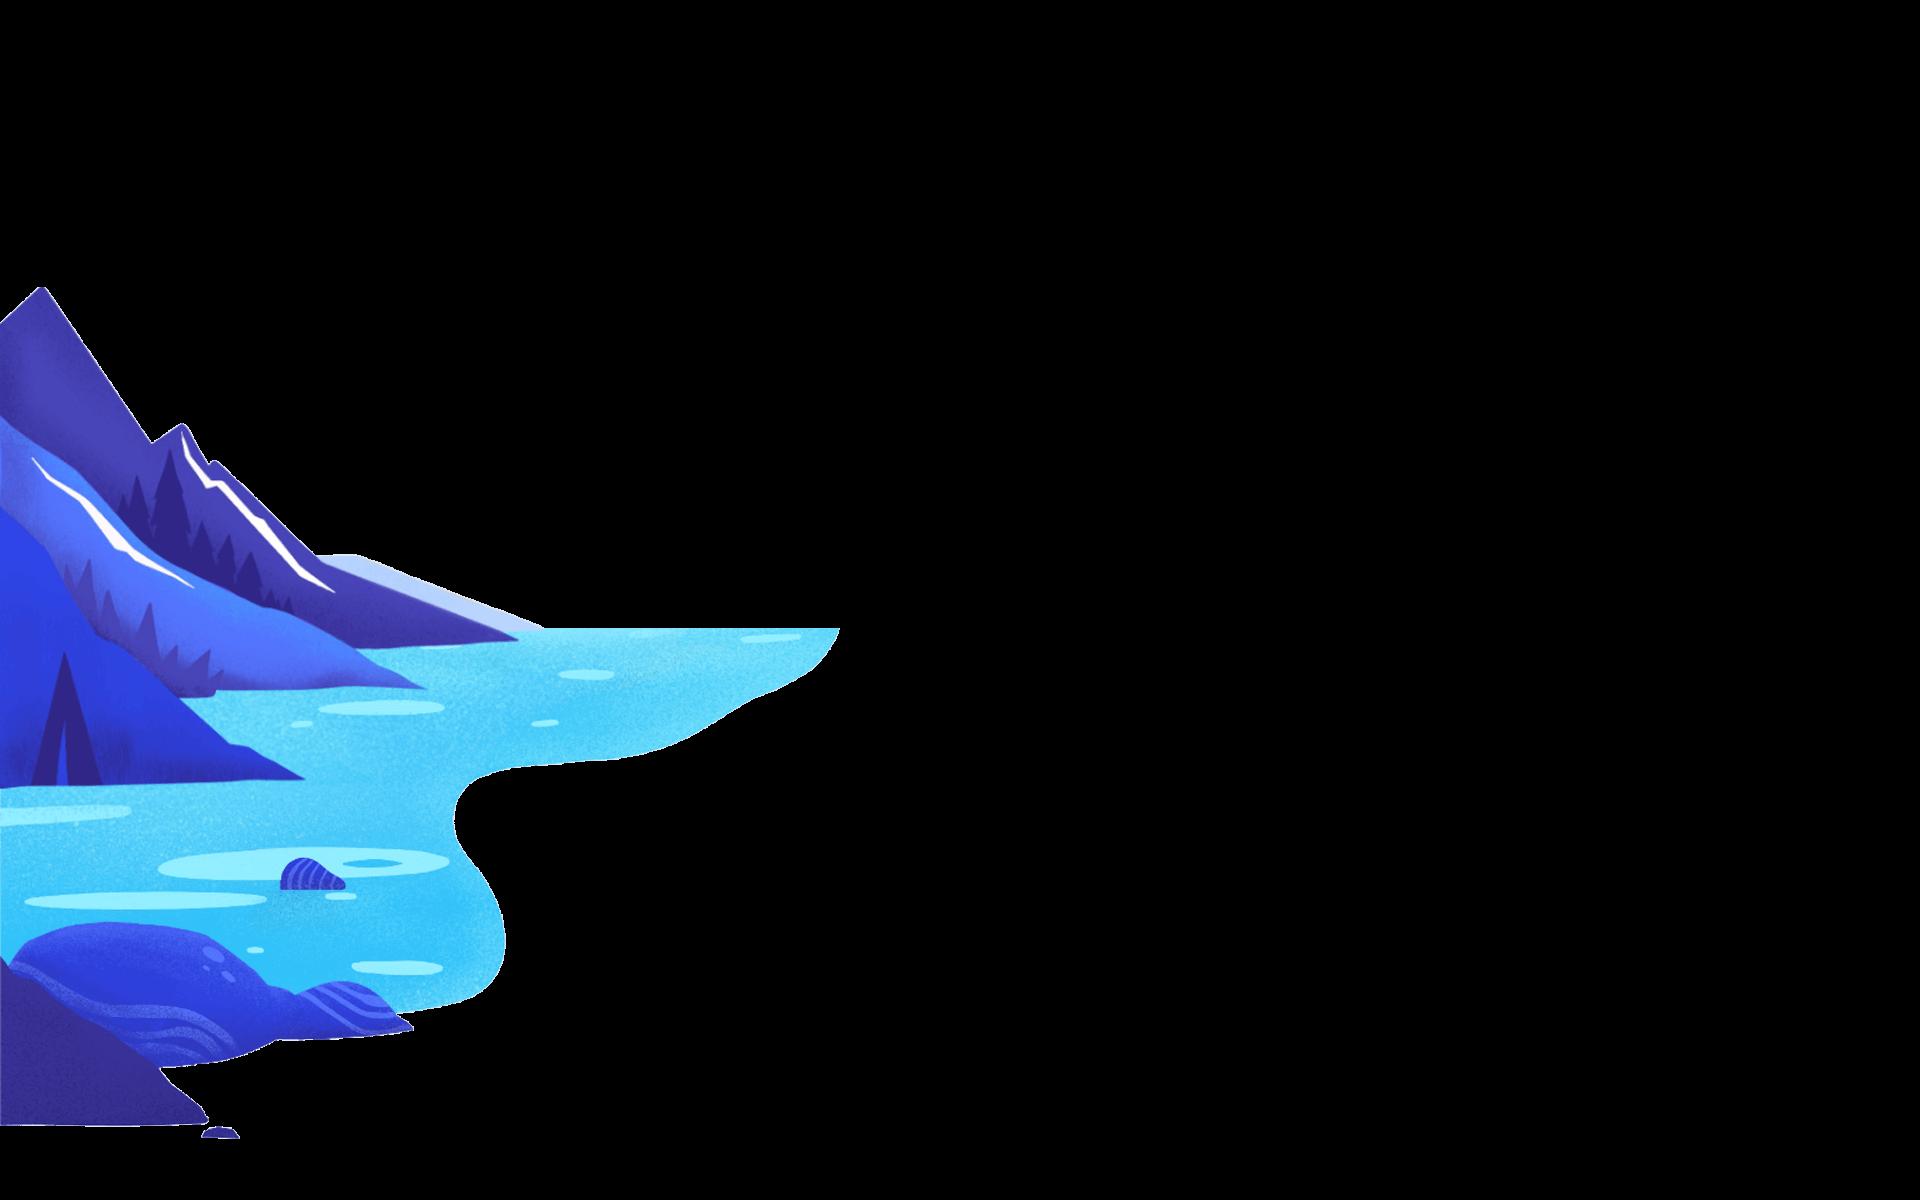 mountainwater background